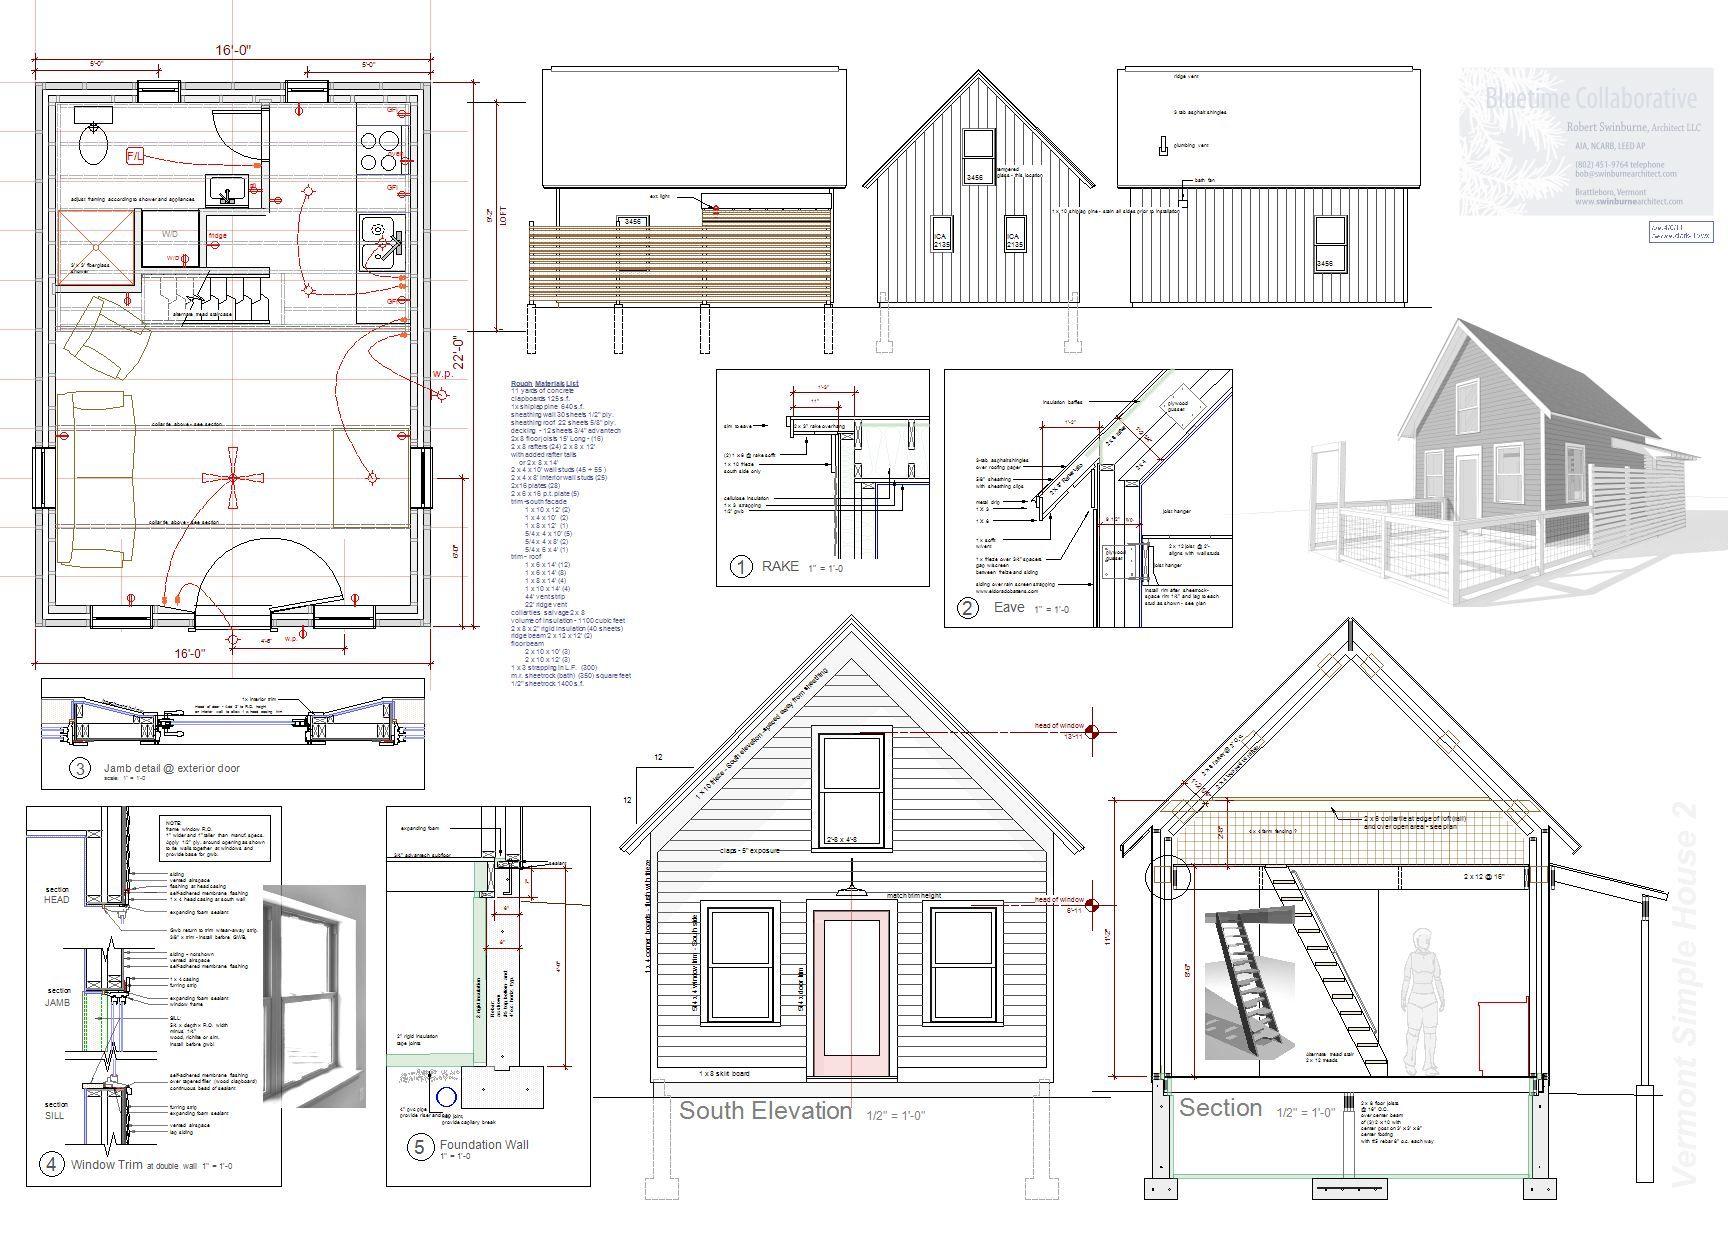 Miraculous 17 Best Images About Tiny House Plans Design Ideas On Pinterest Largest Home Design Picture Inspirations Pitcheantrous